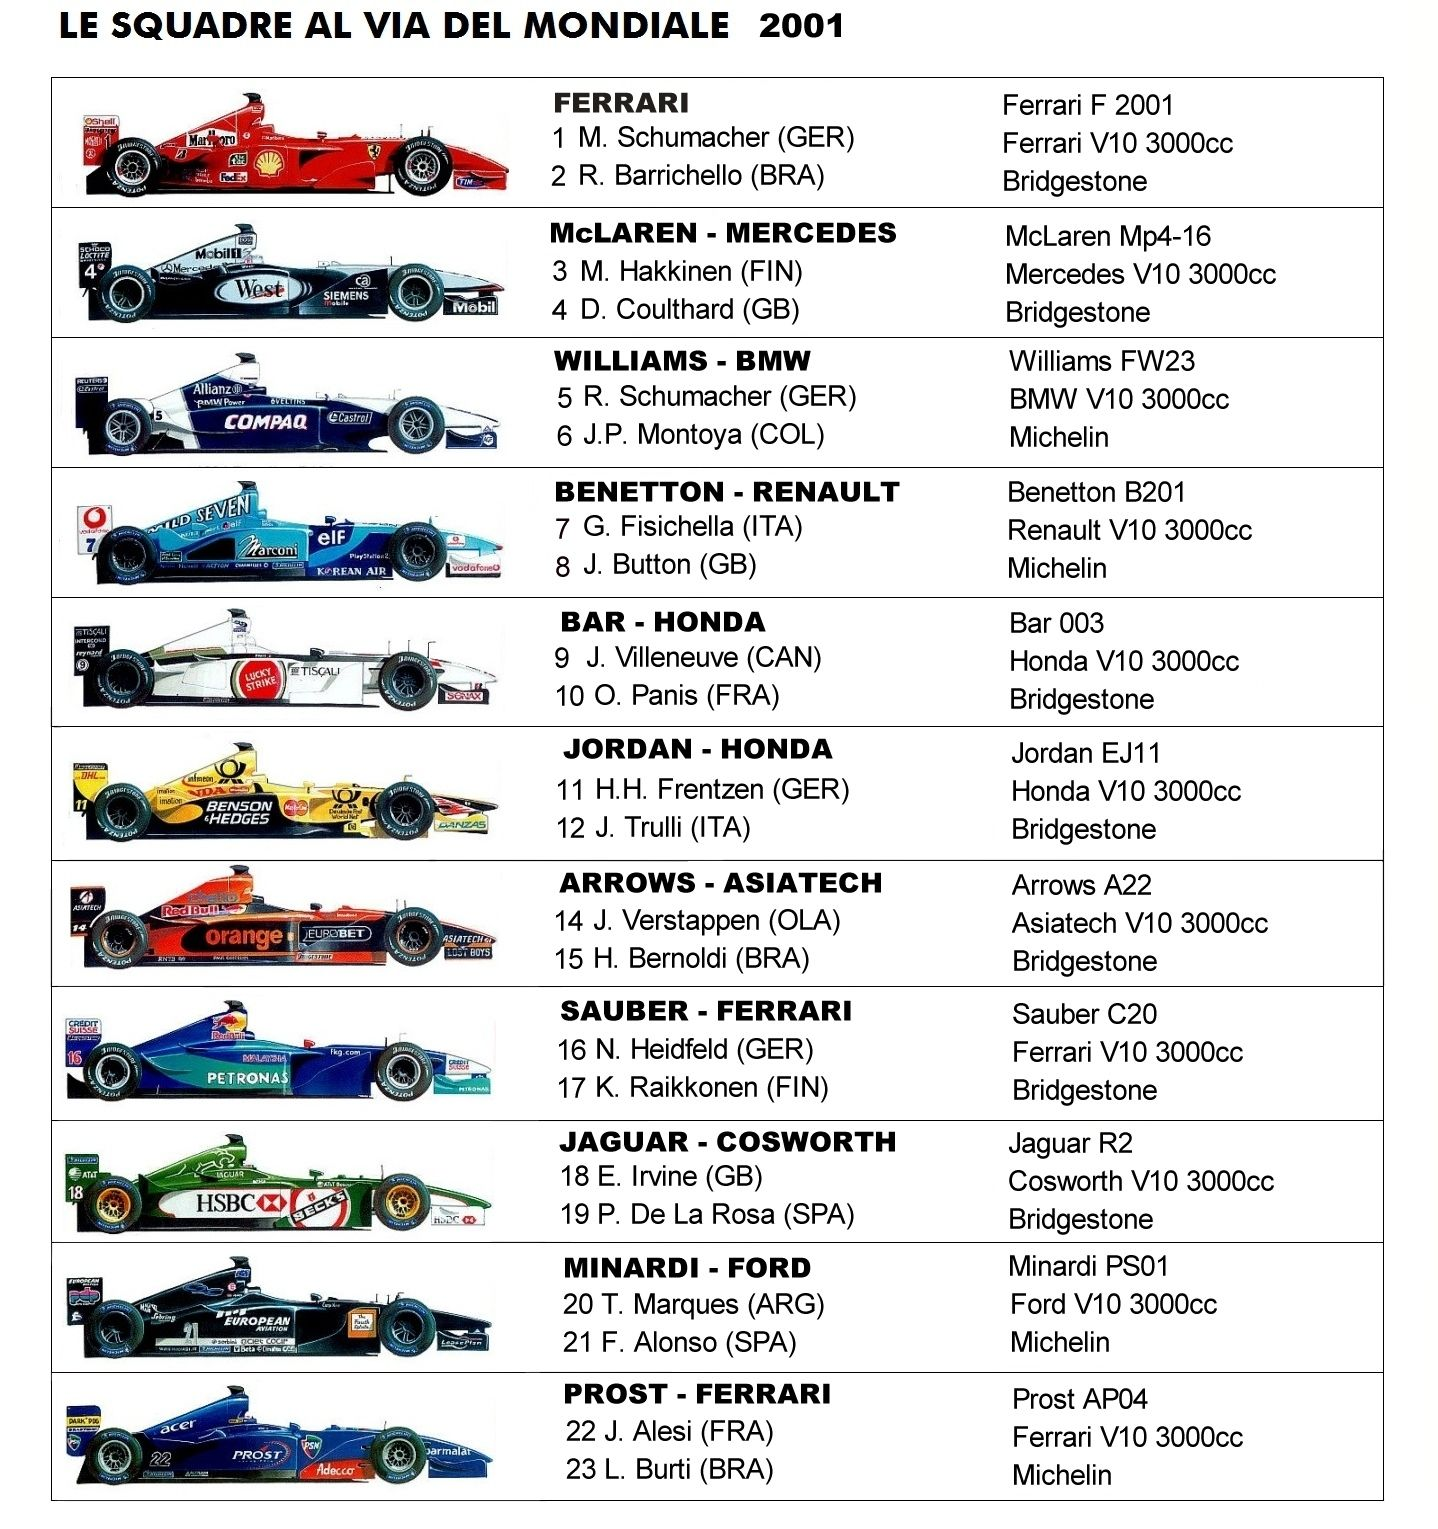 monoposto formula 1 2001